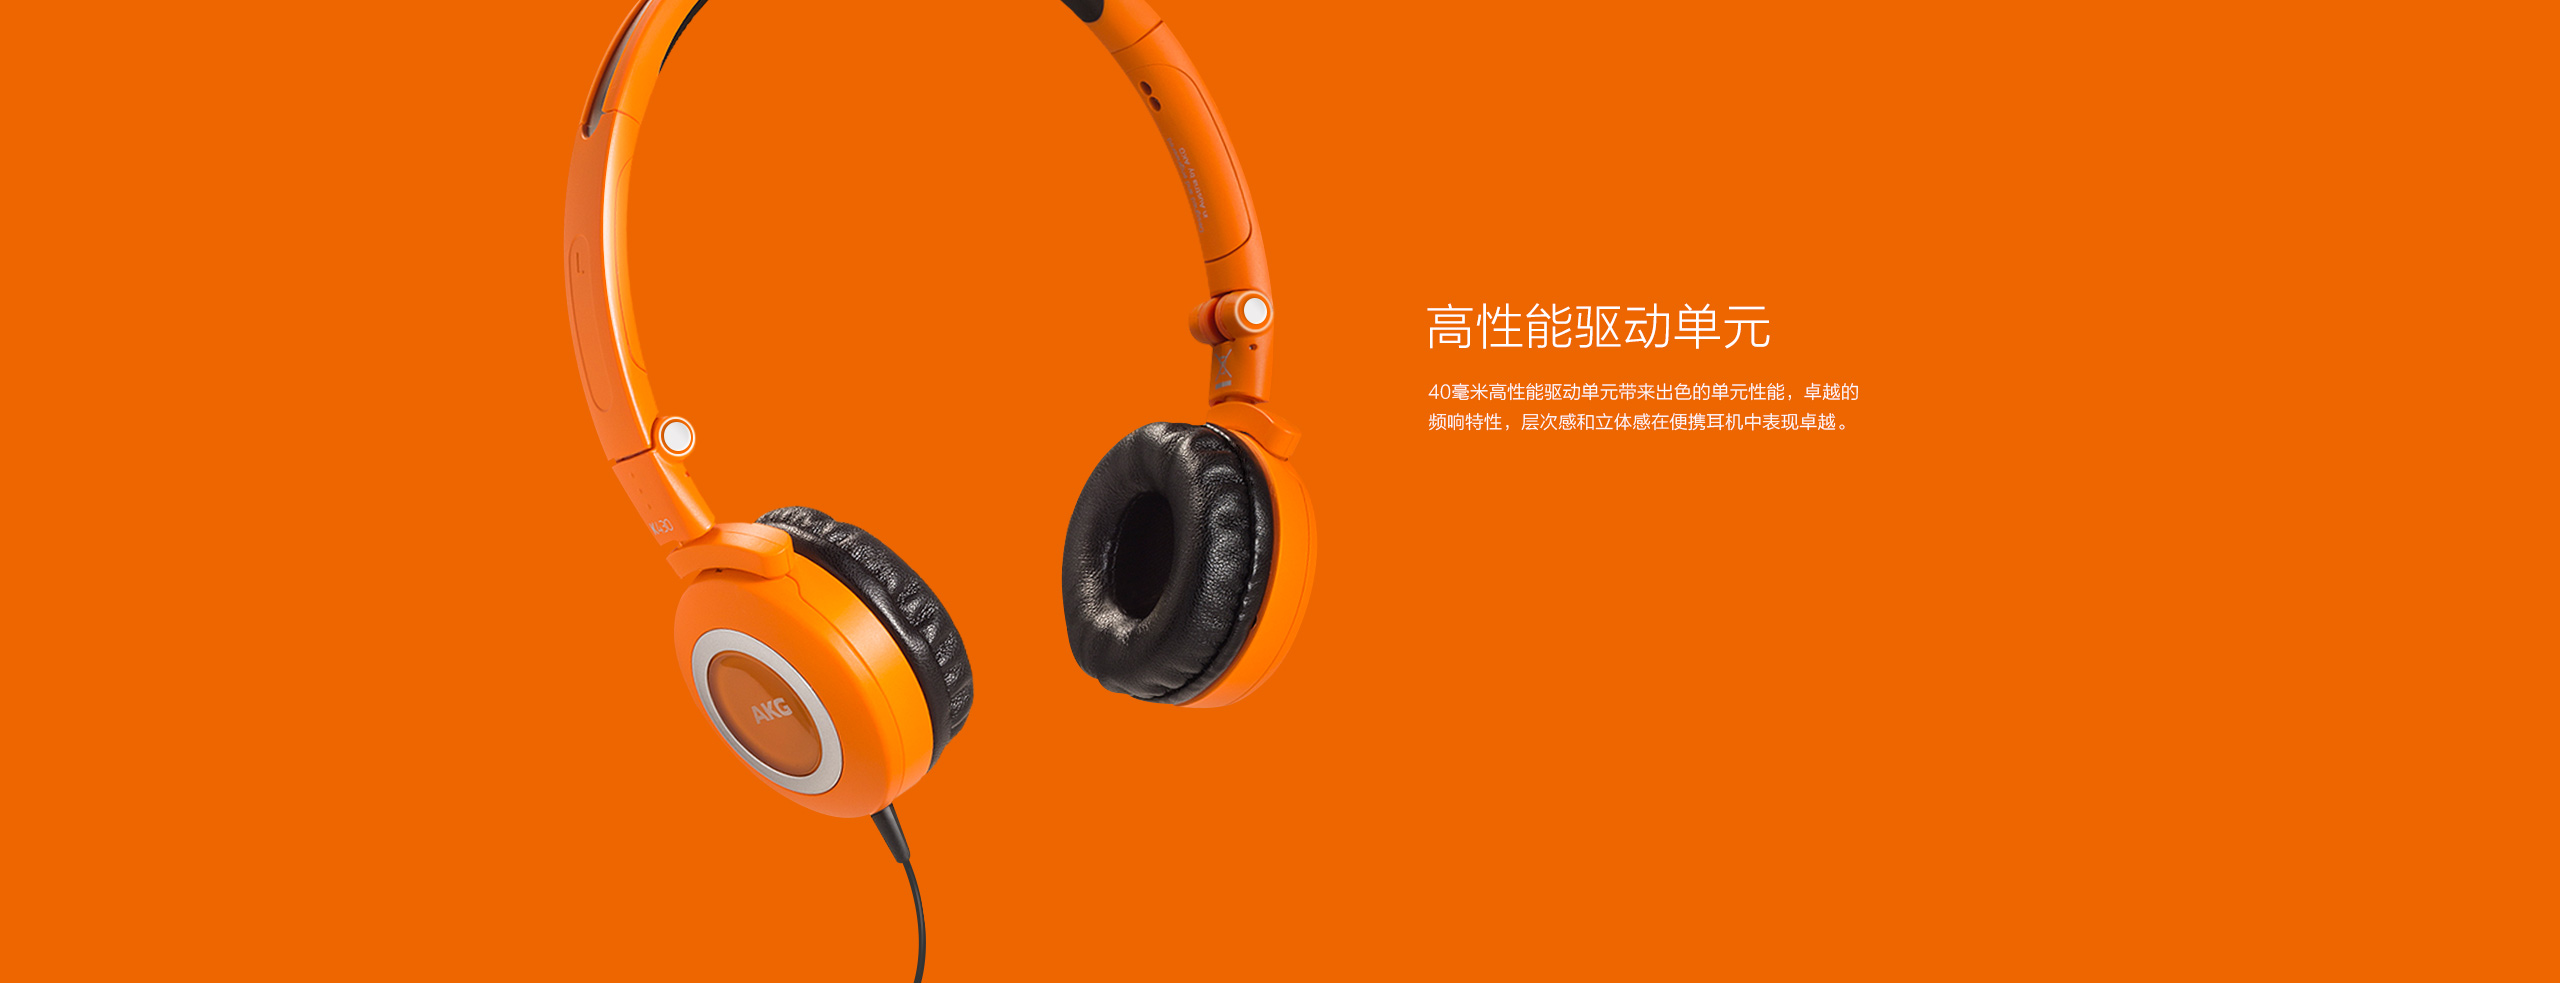 AKG K430LE  头戴式耳机橙色10